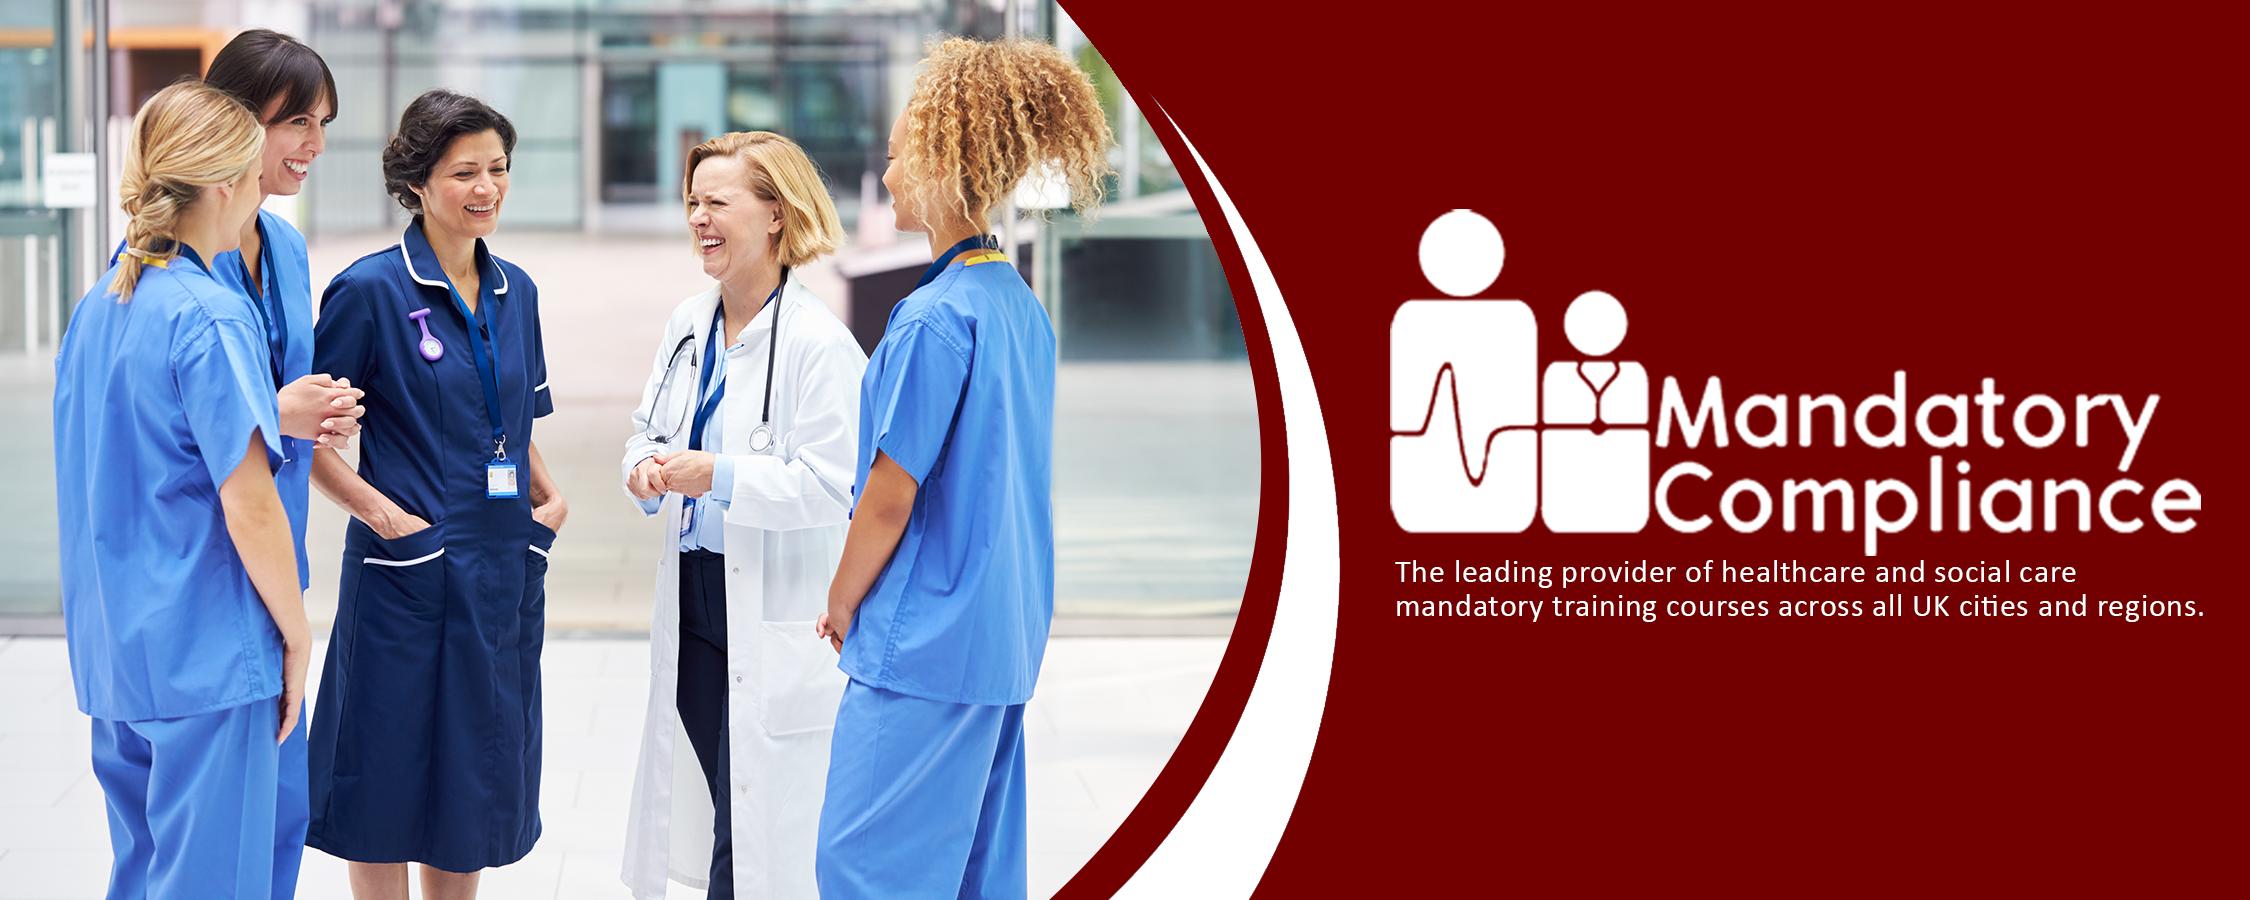 Duty of Care Training - E-Learning Courses - Mandatory Compliance UK -